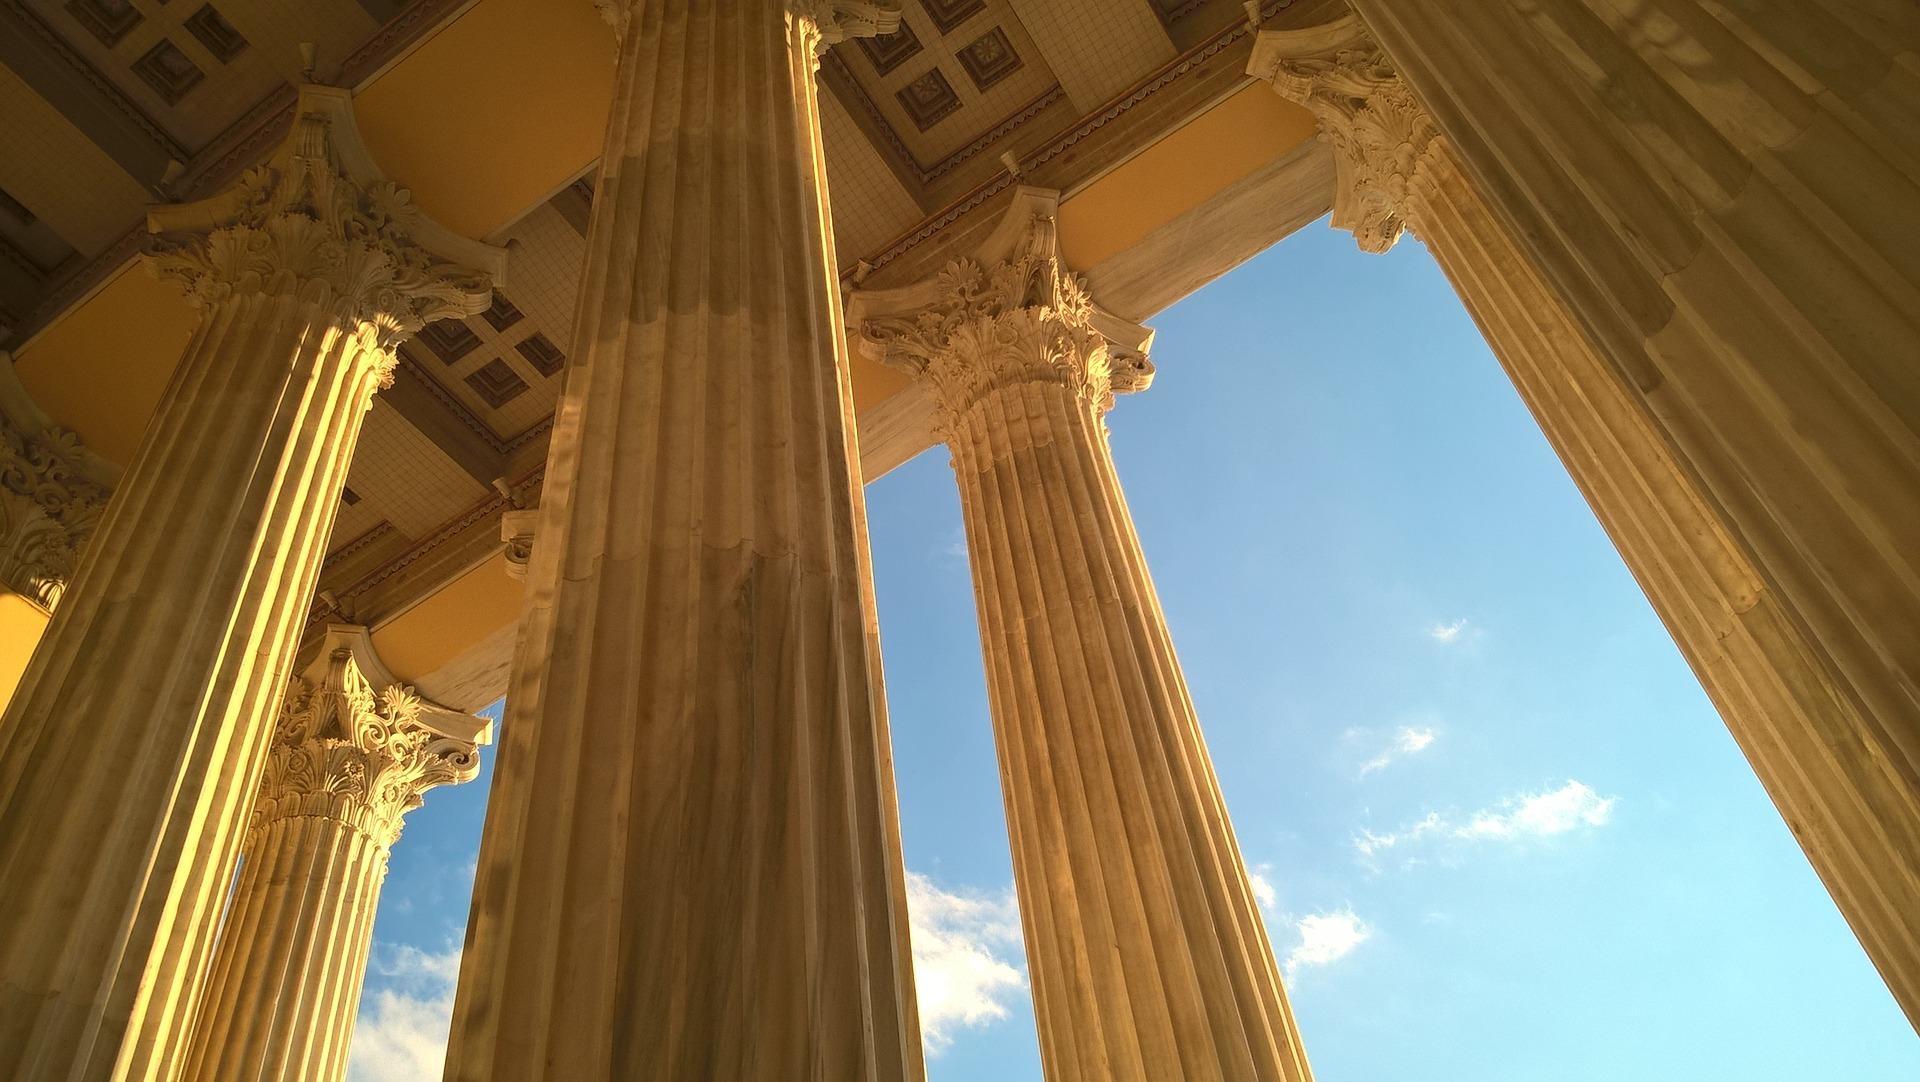 columns-1875814_1920.jpg